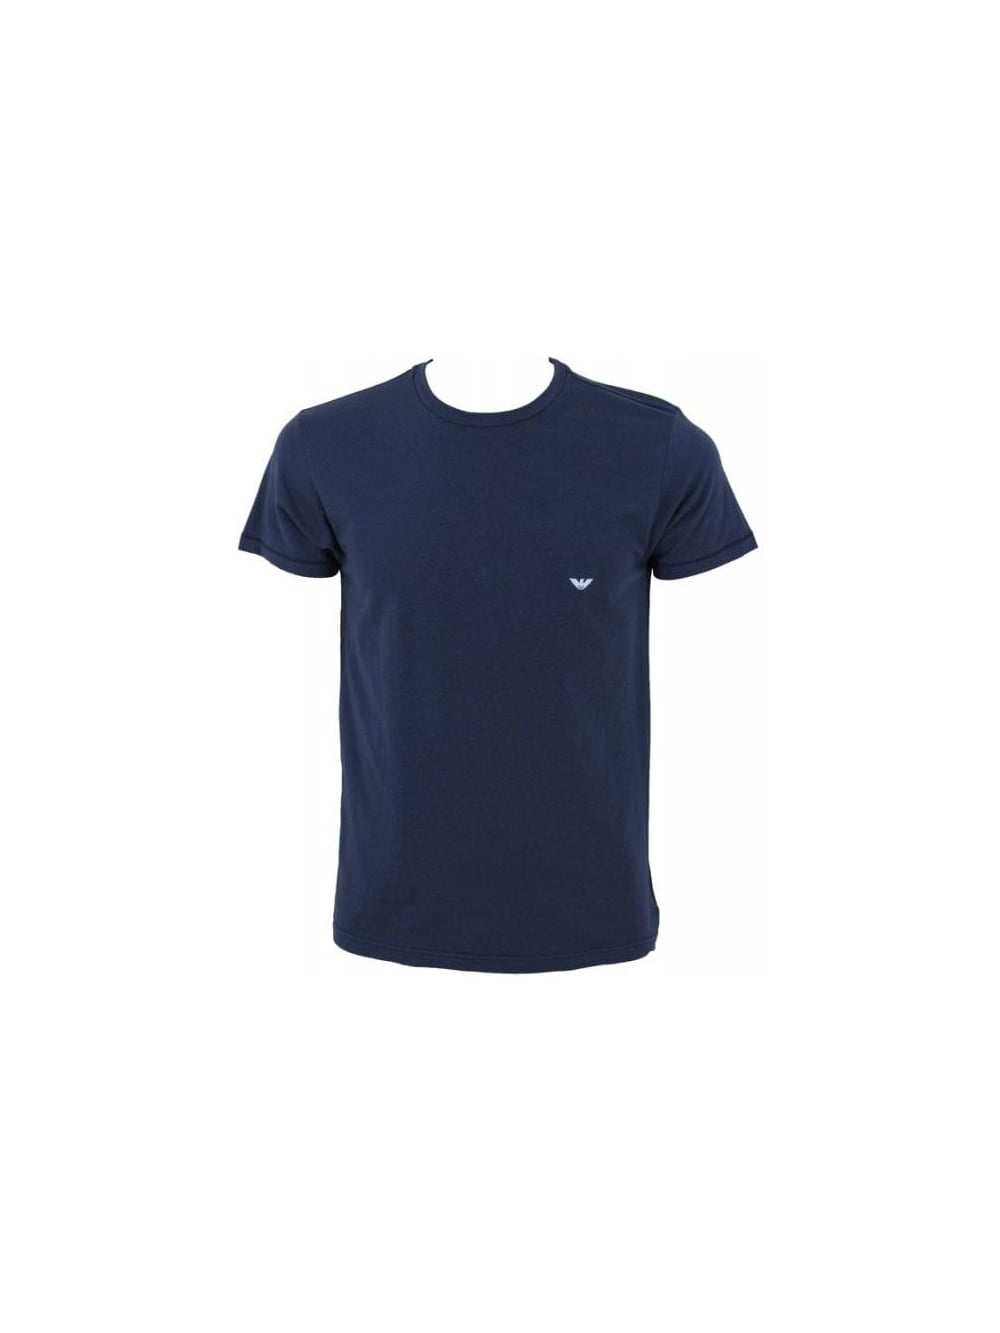 585bd256 Emporio Armani Eagle Logo T.Shirt in Navy - Northern Threads